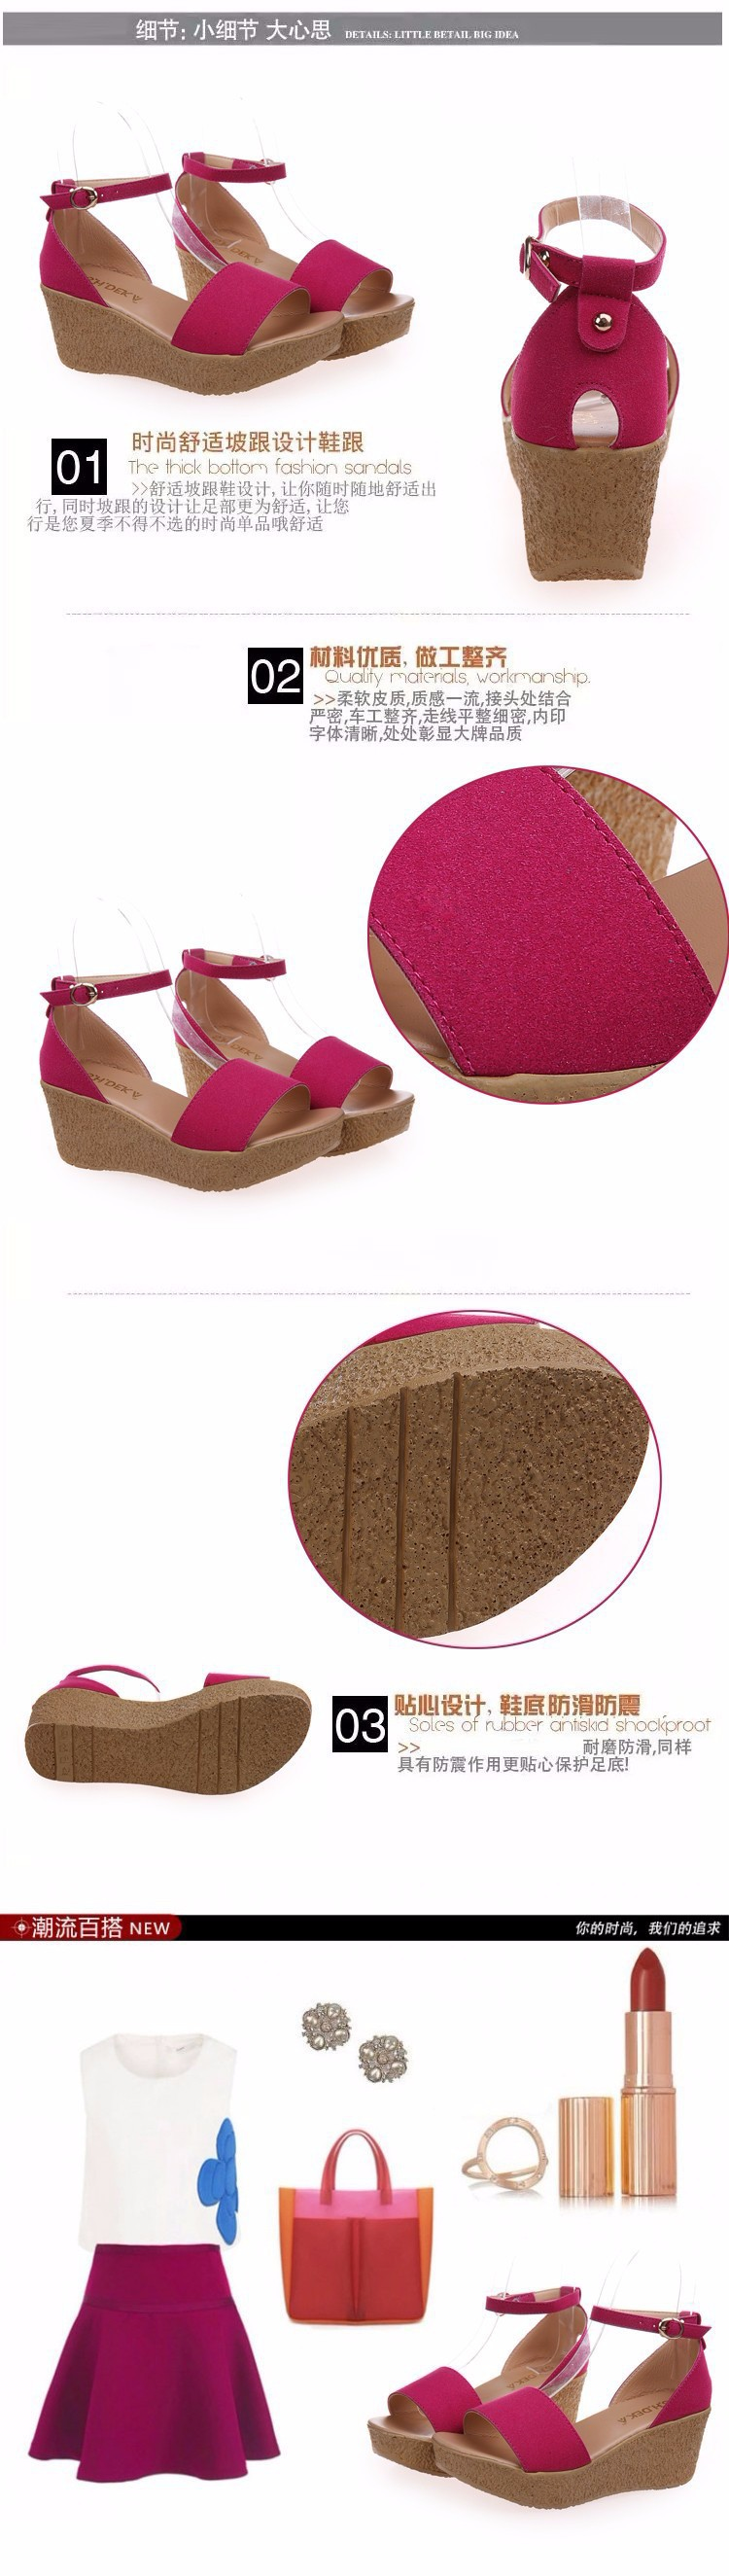 df06e2d0f 2015 shoes Summer Sexy Beautiful Trifle Women Sandals Bohemian ...